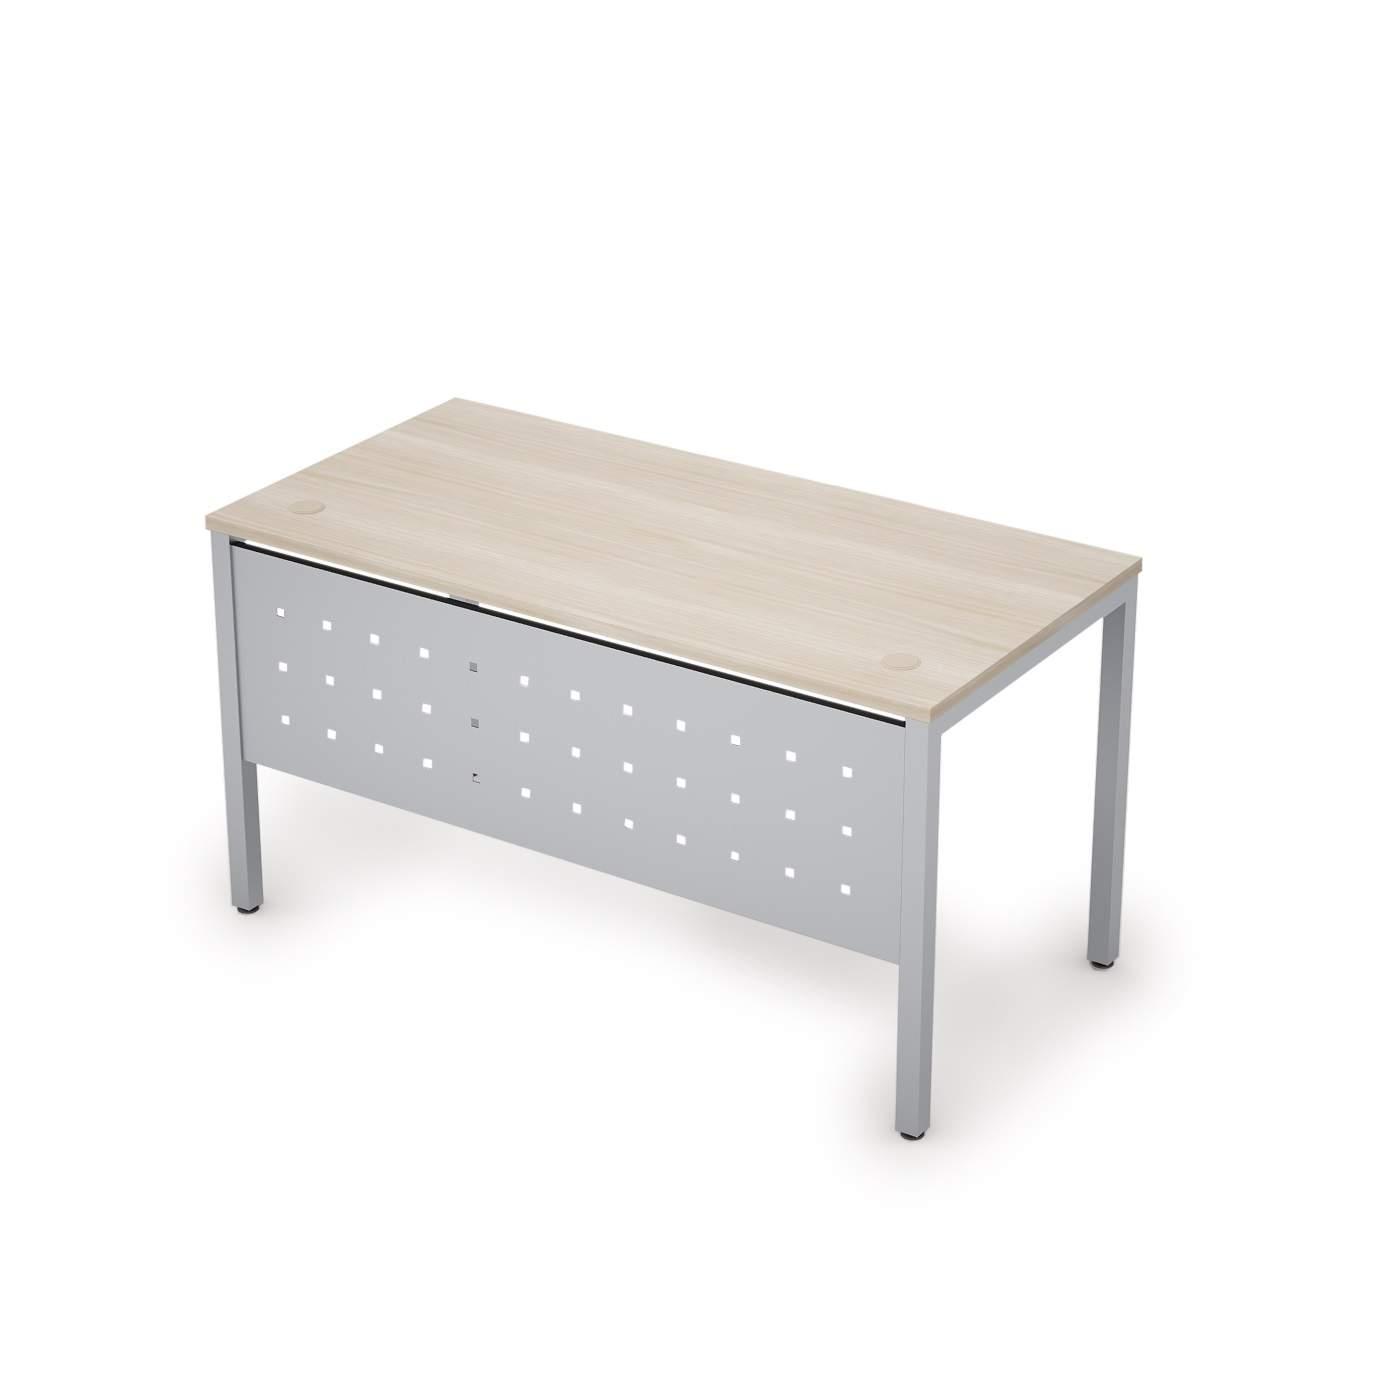 Стол с экраном из металла 1600х700х750